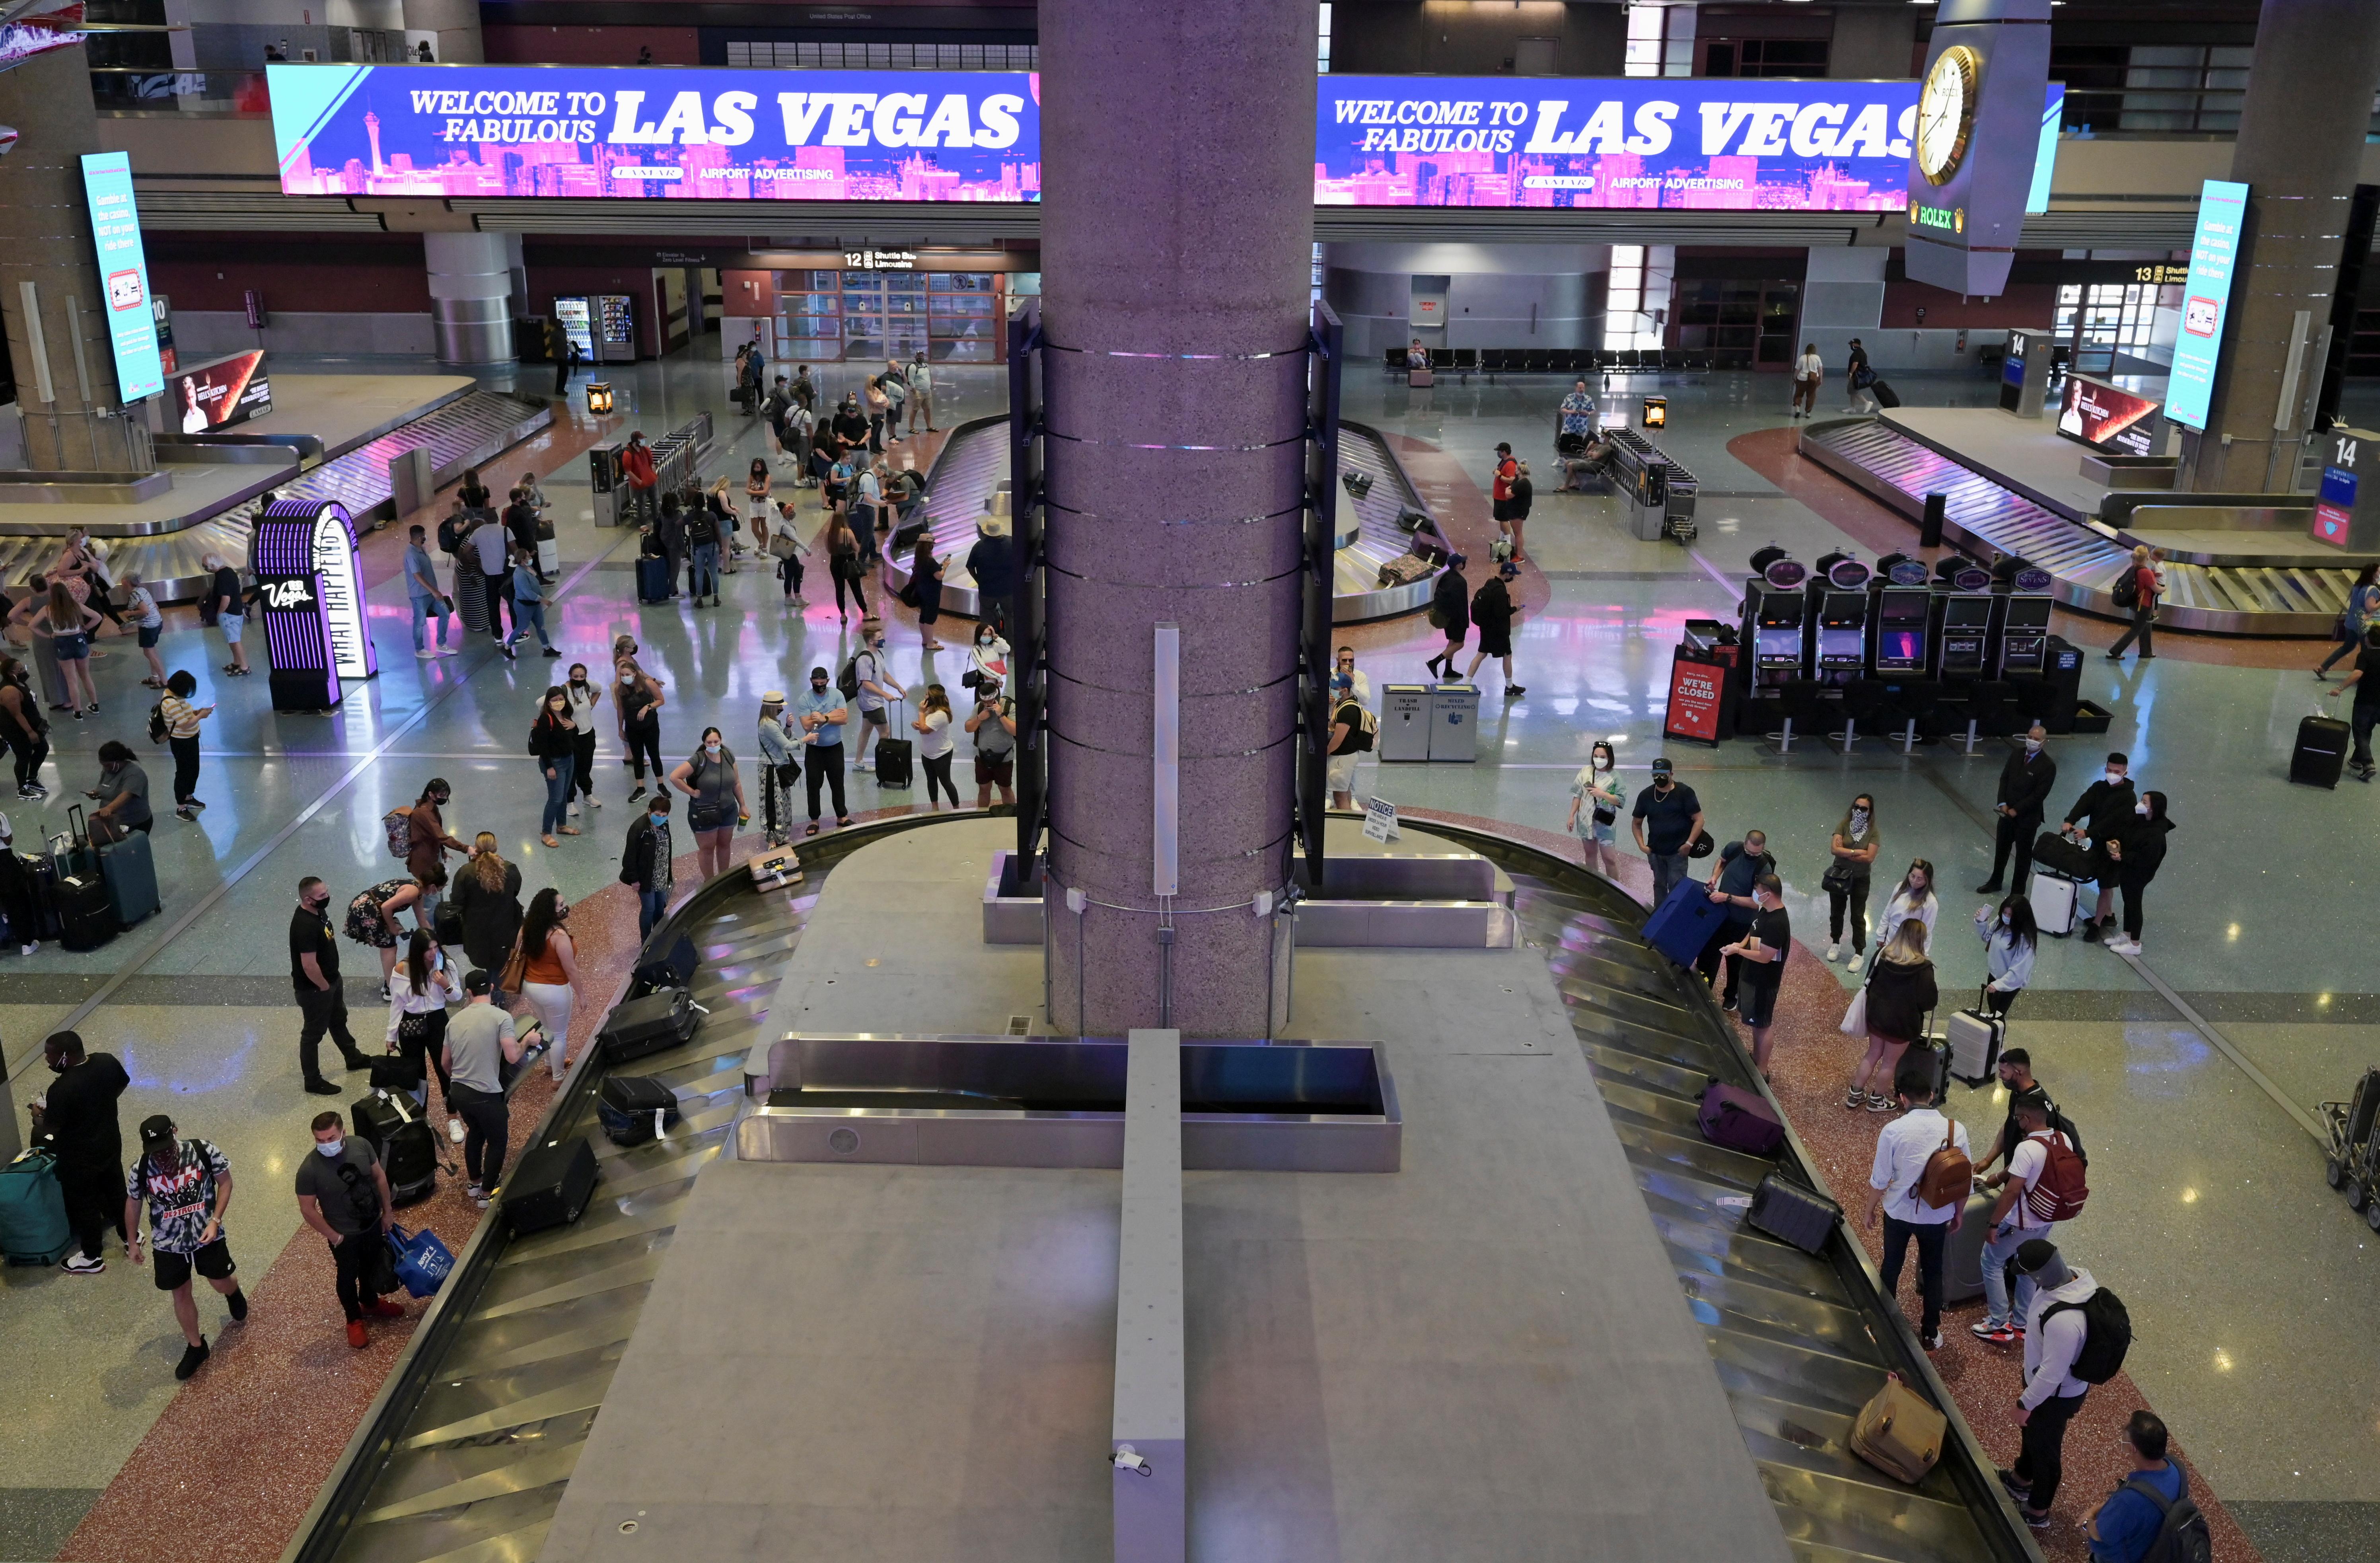 Travelers wait for luggage as they flock to Las Vegas ahead of Memorial Day weekend at McCarran International Airport in Las Vegas, Nevada, U.S., May 28, 2021.  REUTERS/Bridget Bennett